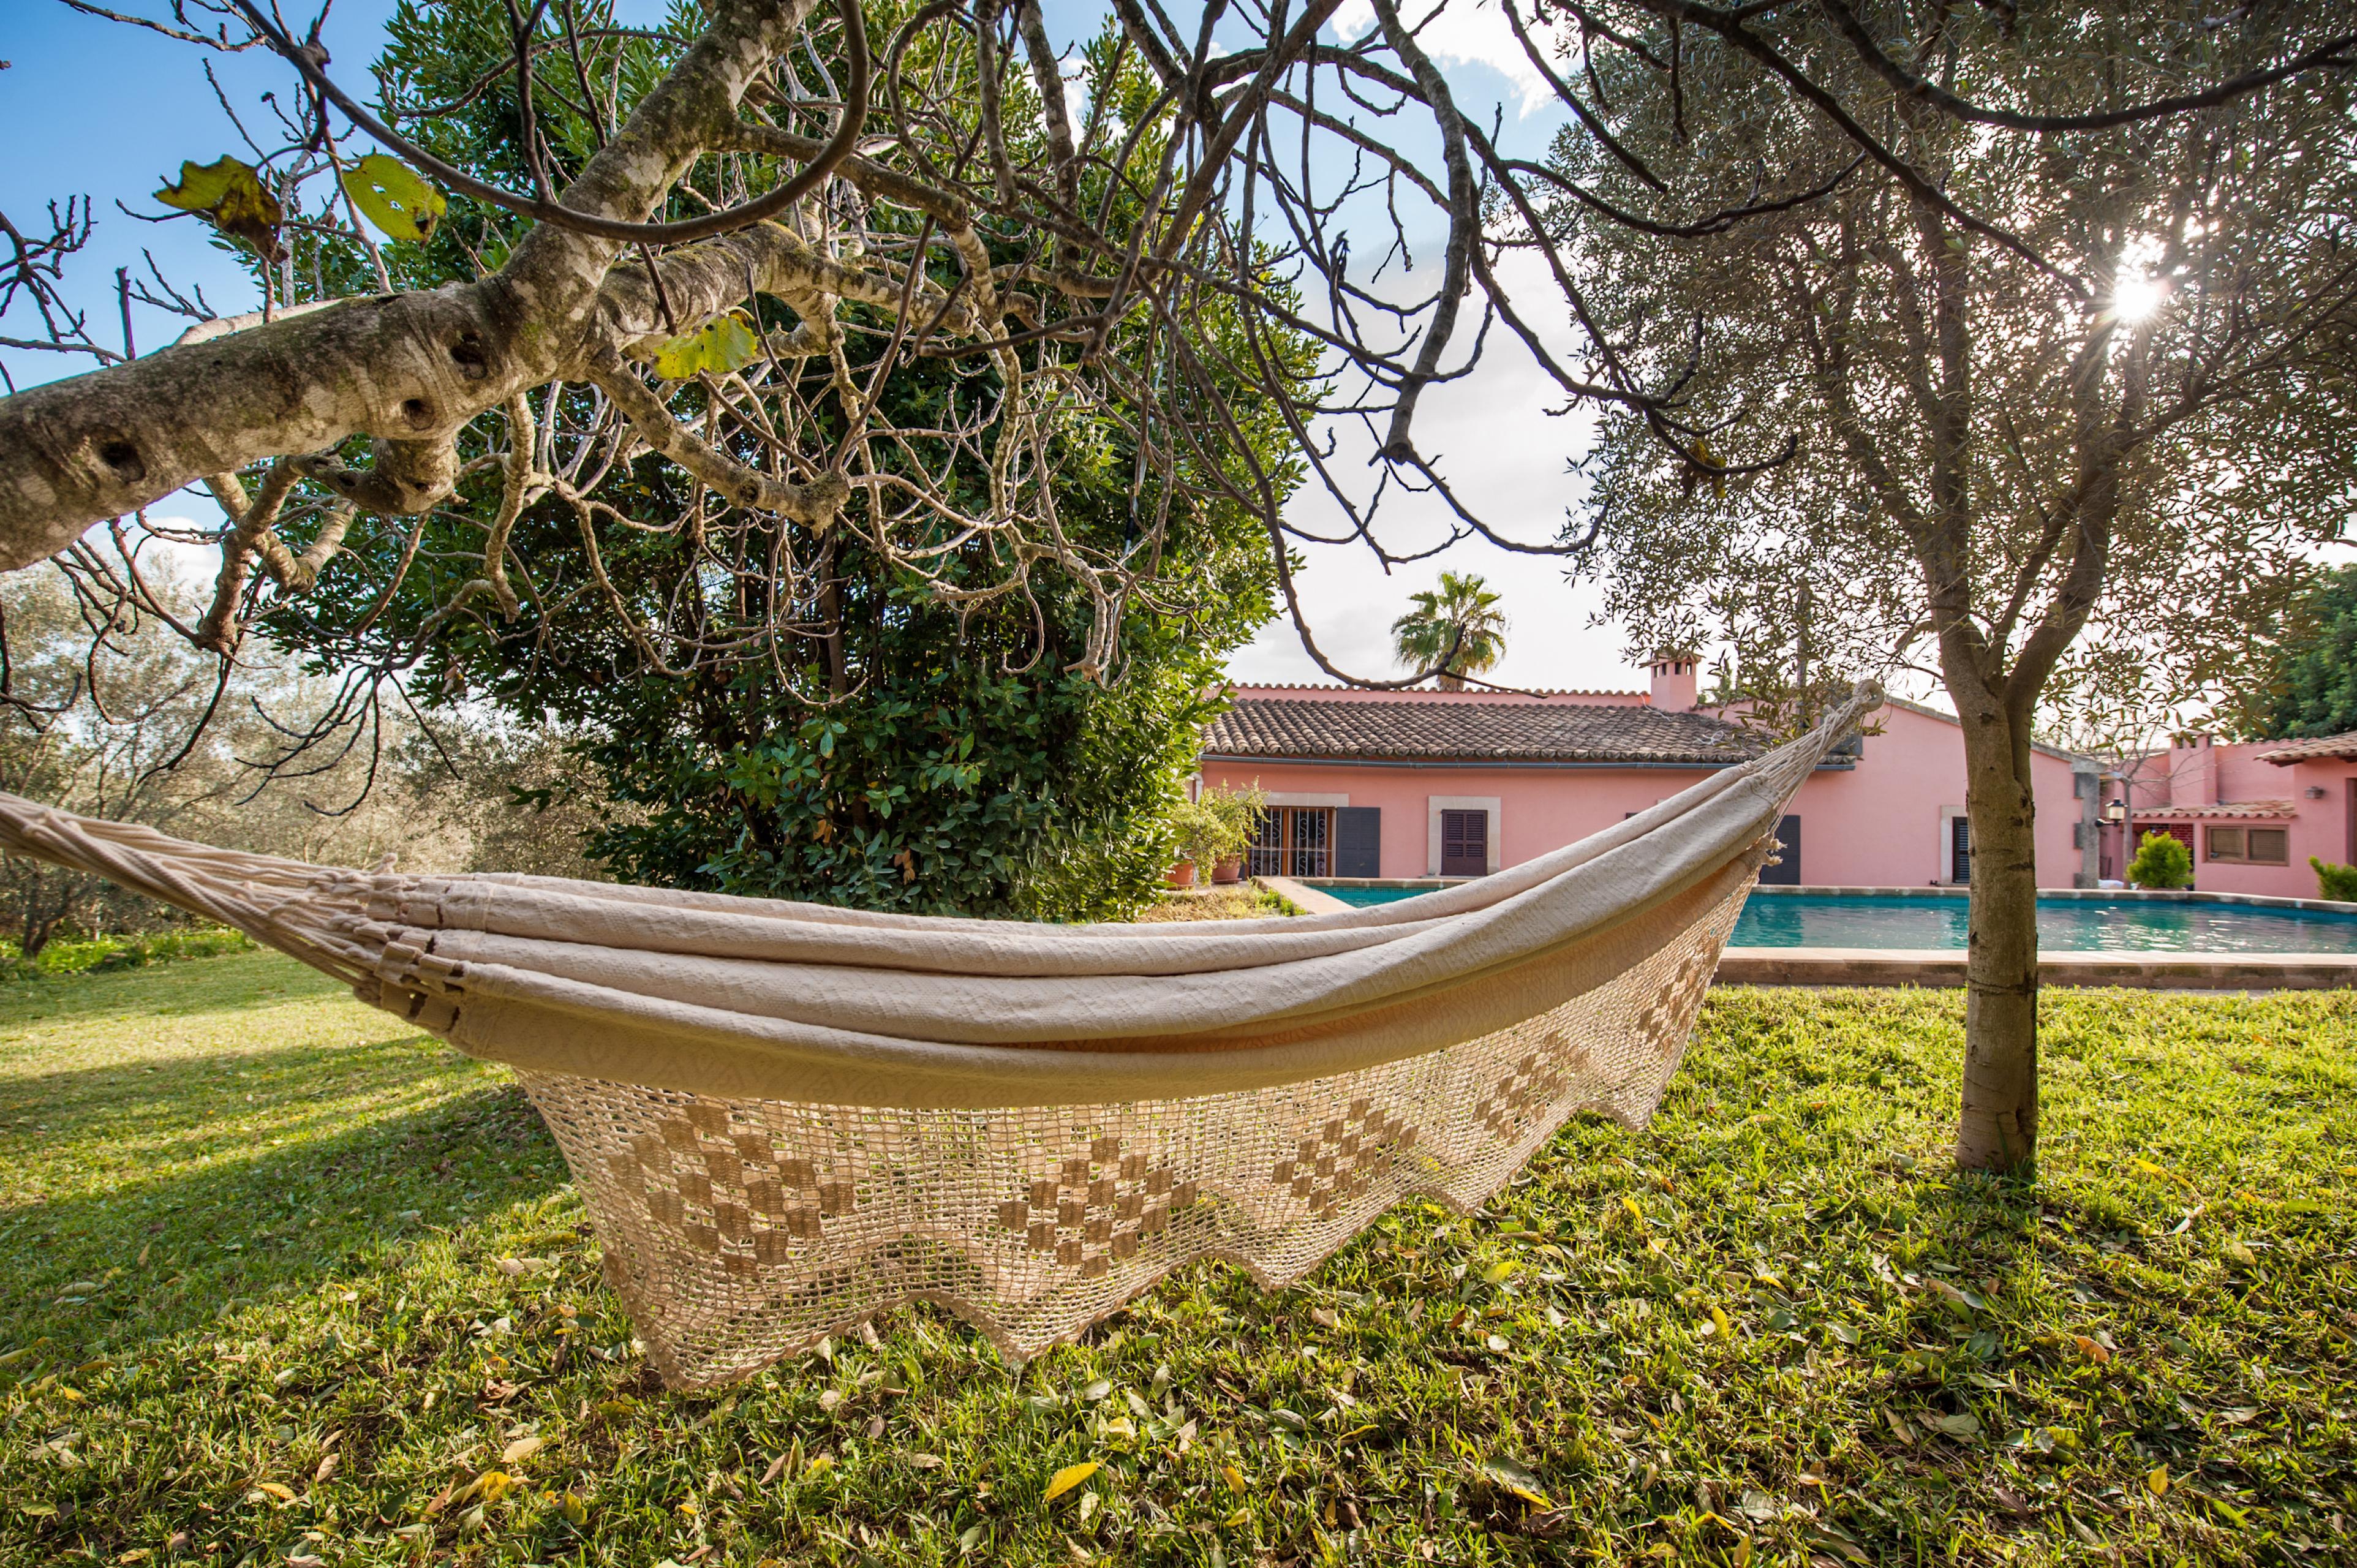 Maison de vacances CA'N LLUC- Alaró- MALLORCA - Kostenloses WLAN (2687507), Alaro, Majorque, Iles Baléares, Espagne, image 3